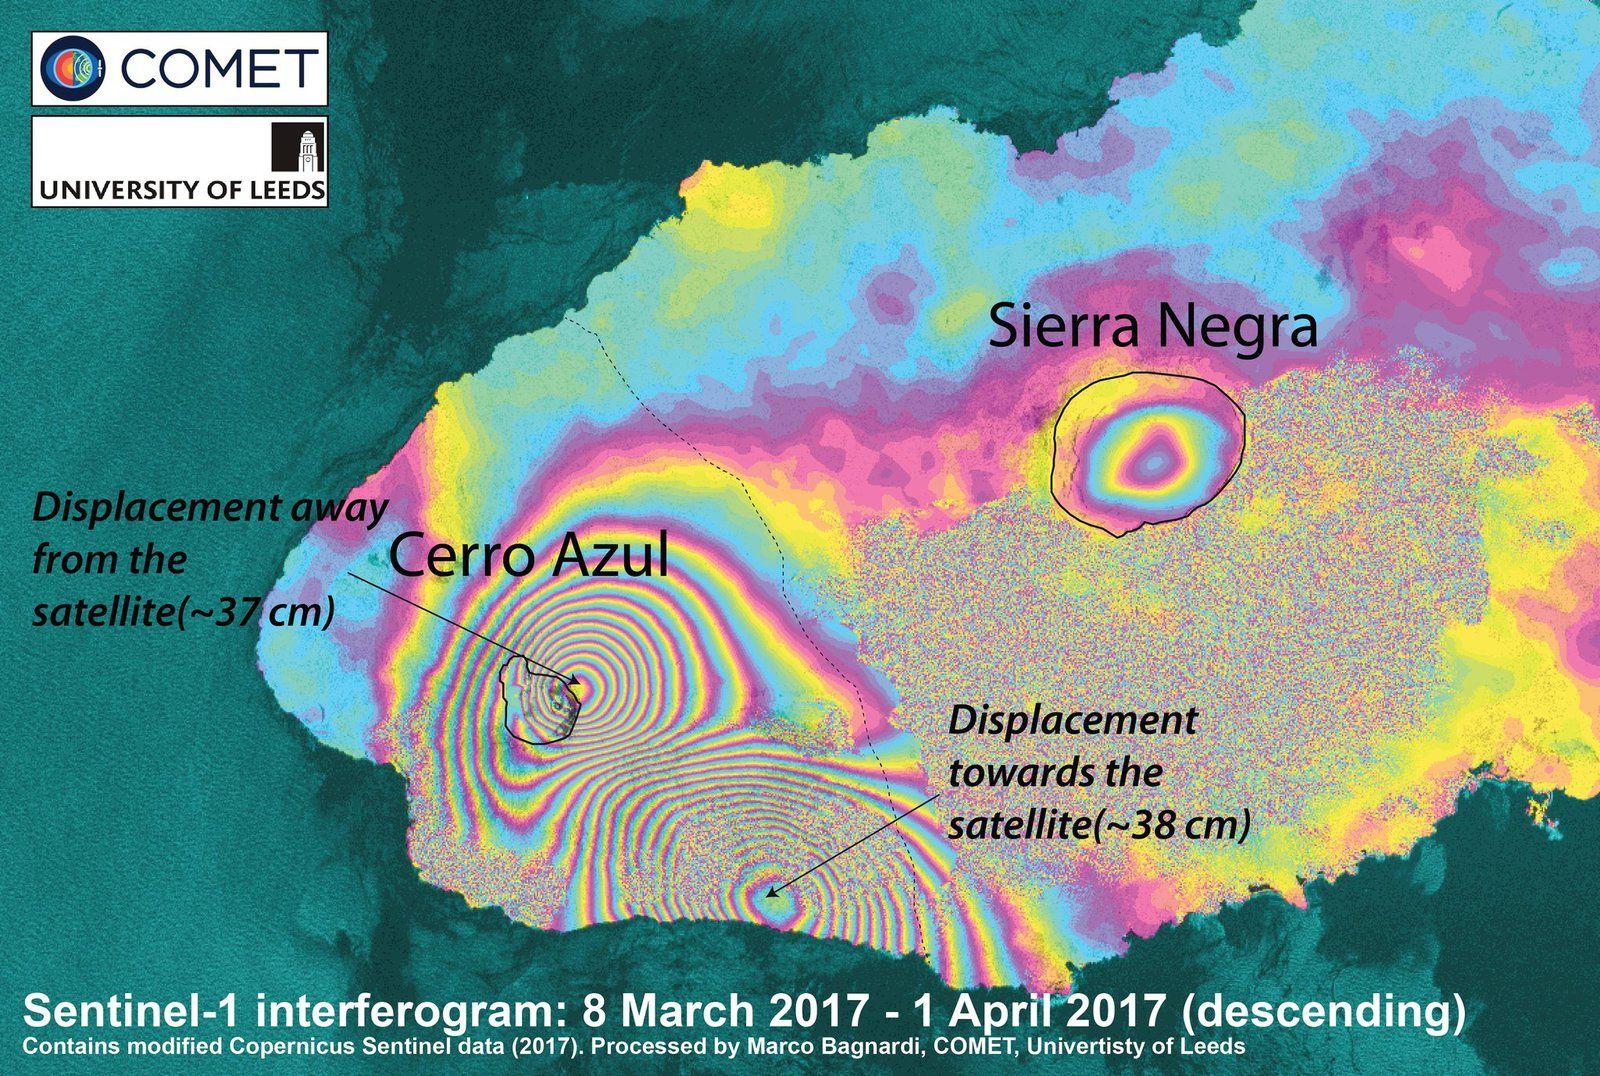 Cerro Azul / isabela island - radar interferogram between 8 March and 1 April 2017 - Doc Sentinel-1 / Comet / modified by Marco Bagnardi, University of Leeds.